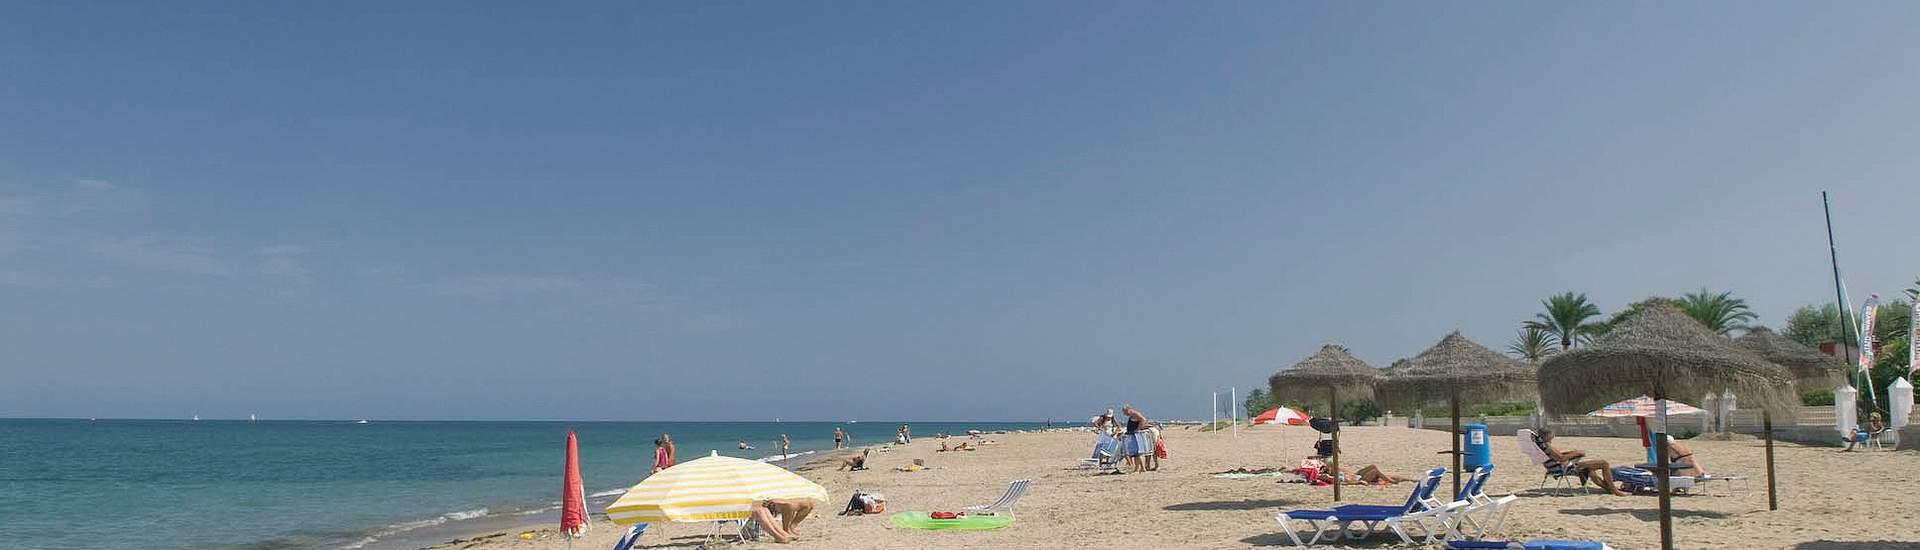 Spanisch Familiensprachreise Dénia, Spanien